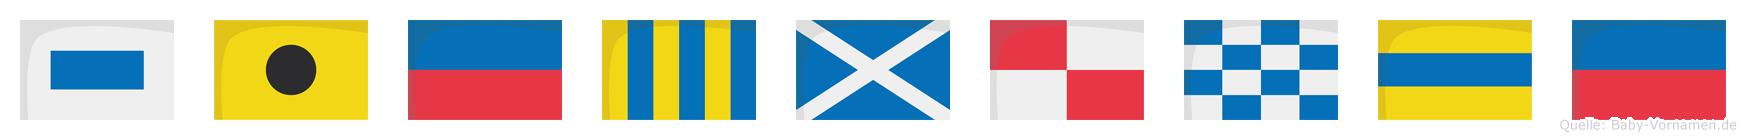 Siegmunde im Flaggenalphabet